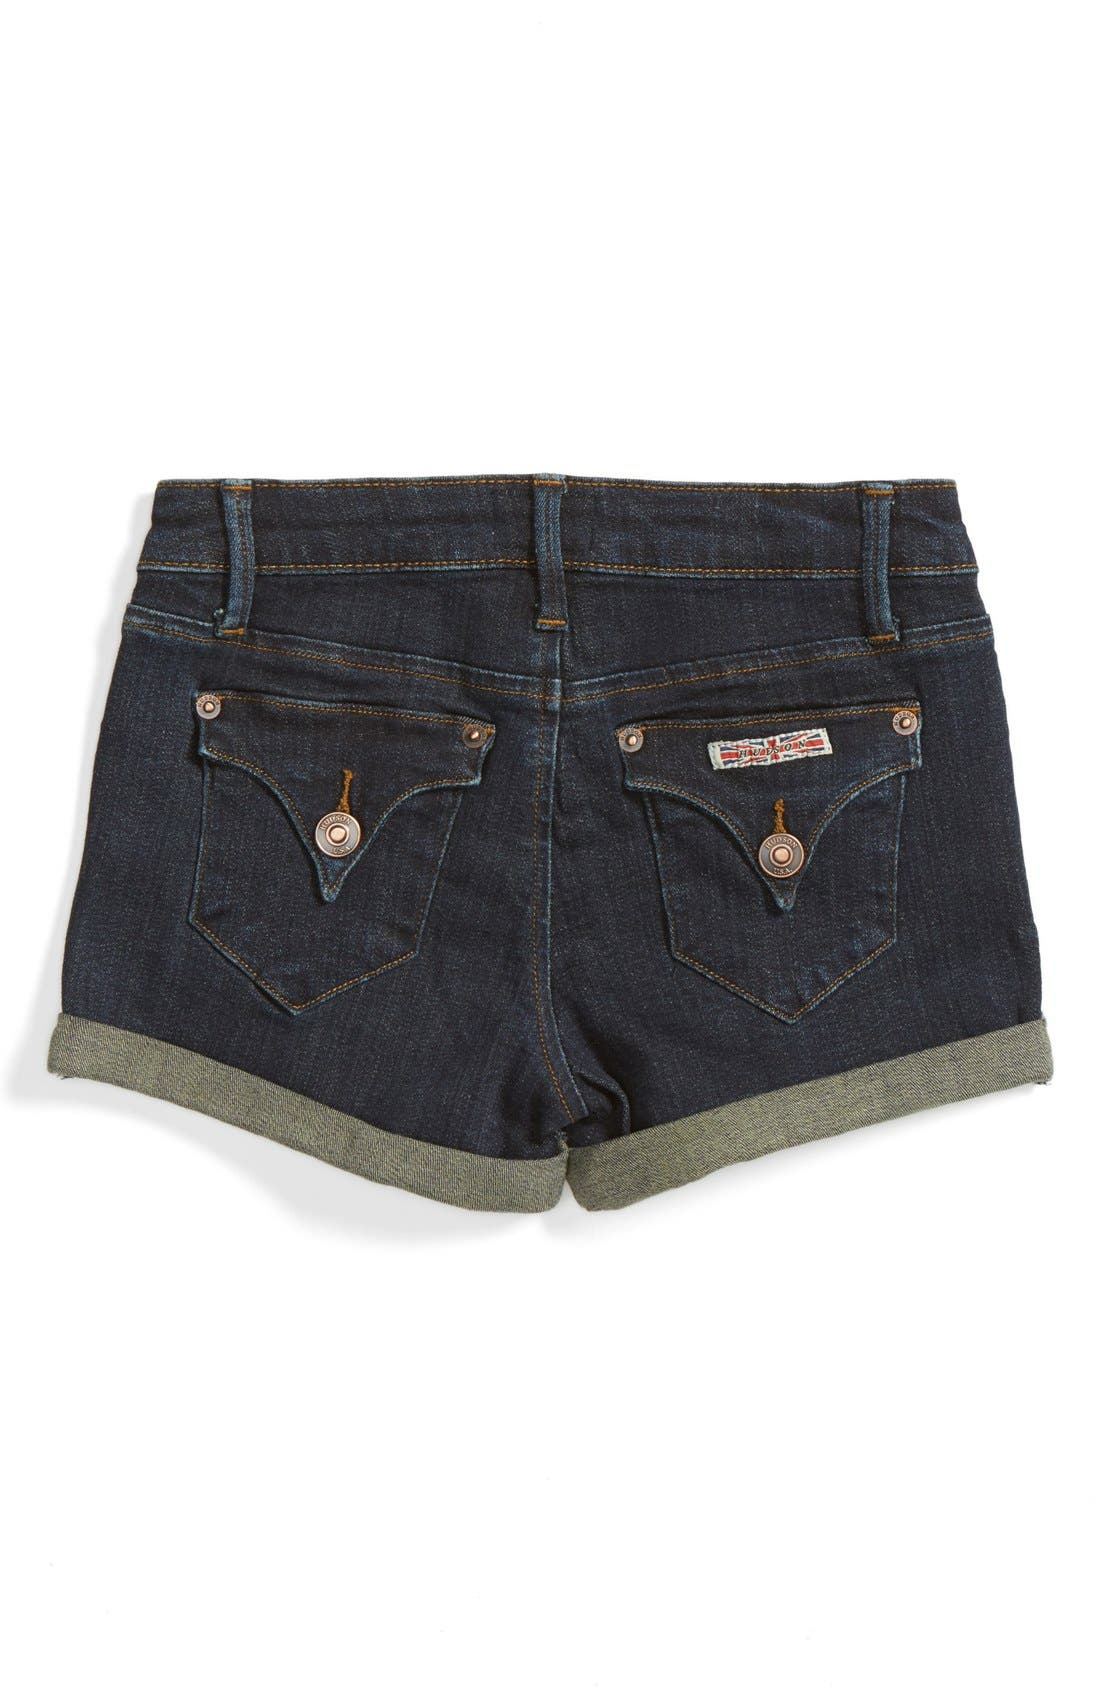 Roll Cuff Denim Shorts,                             Alternate thumbnail 6, color,